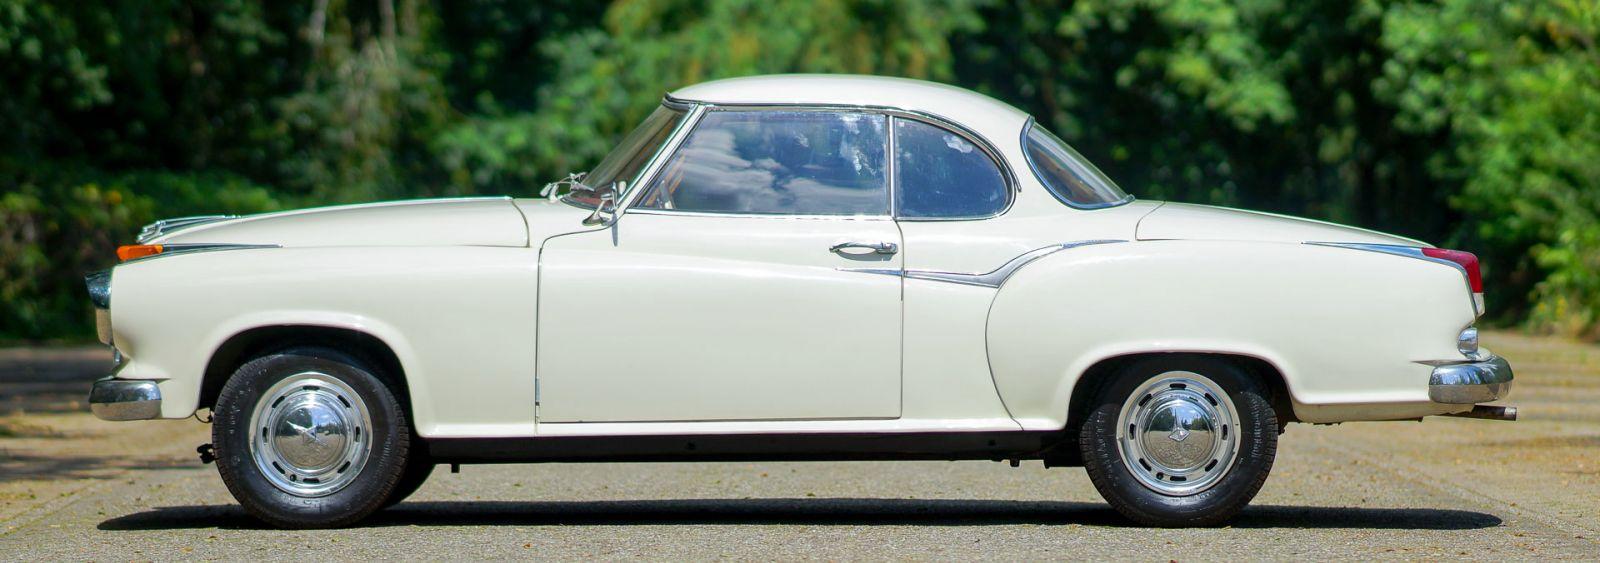 borgward-isabella-coupe-1958-white-weiss-blanc-wit-